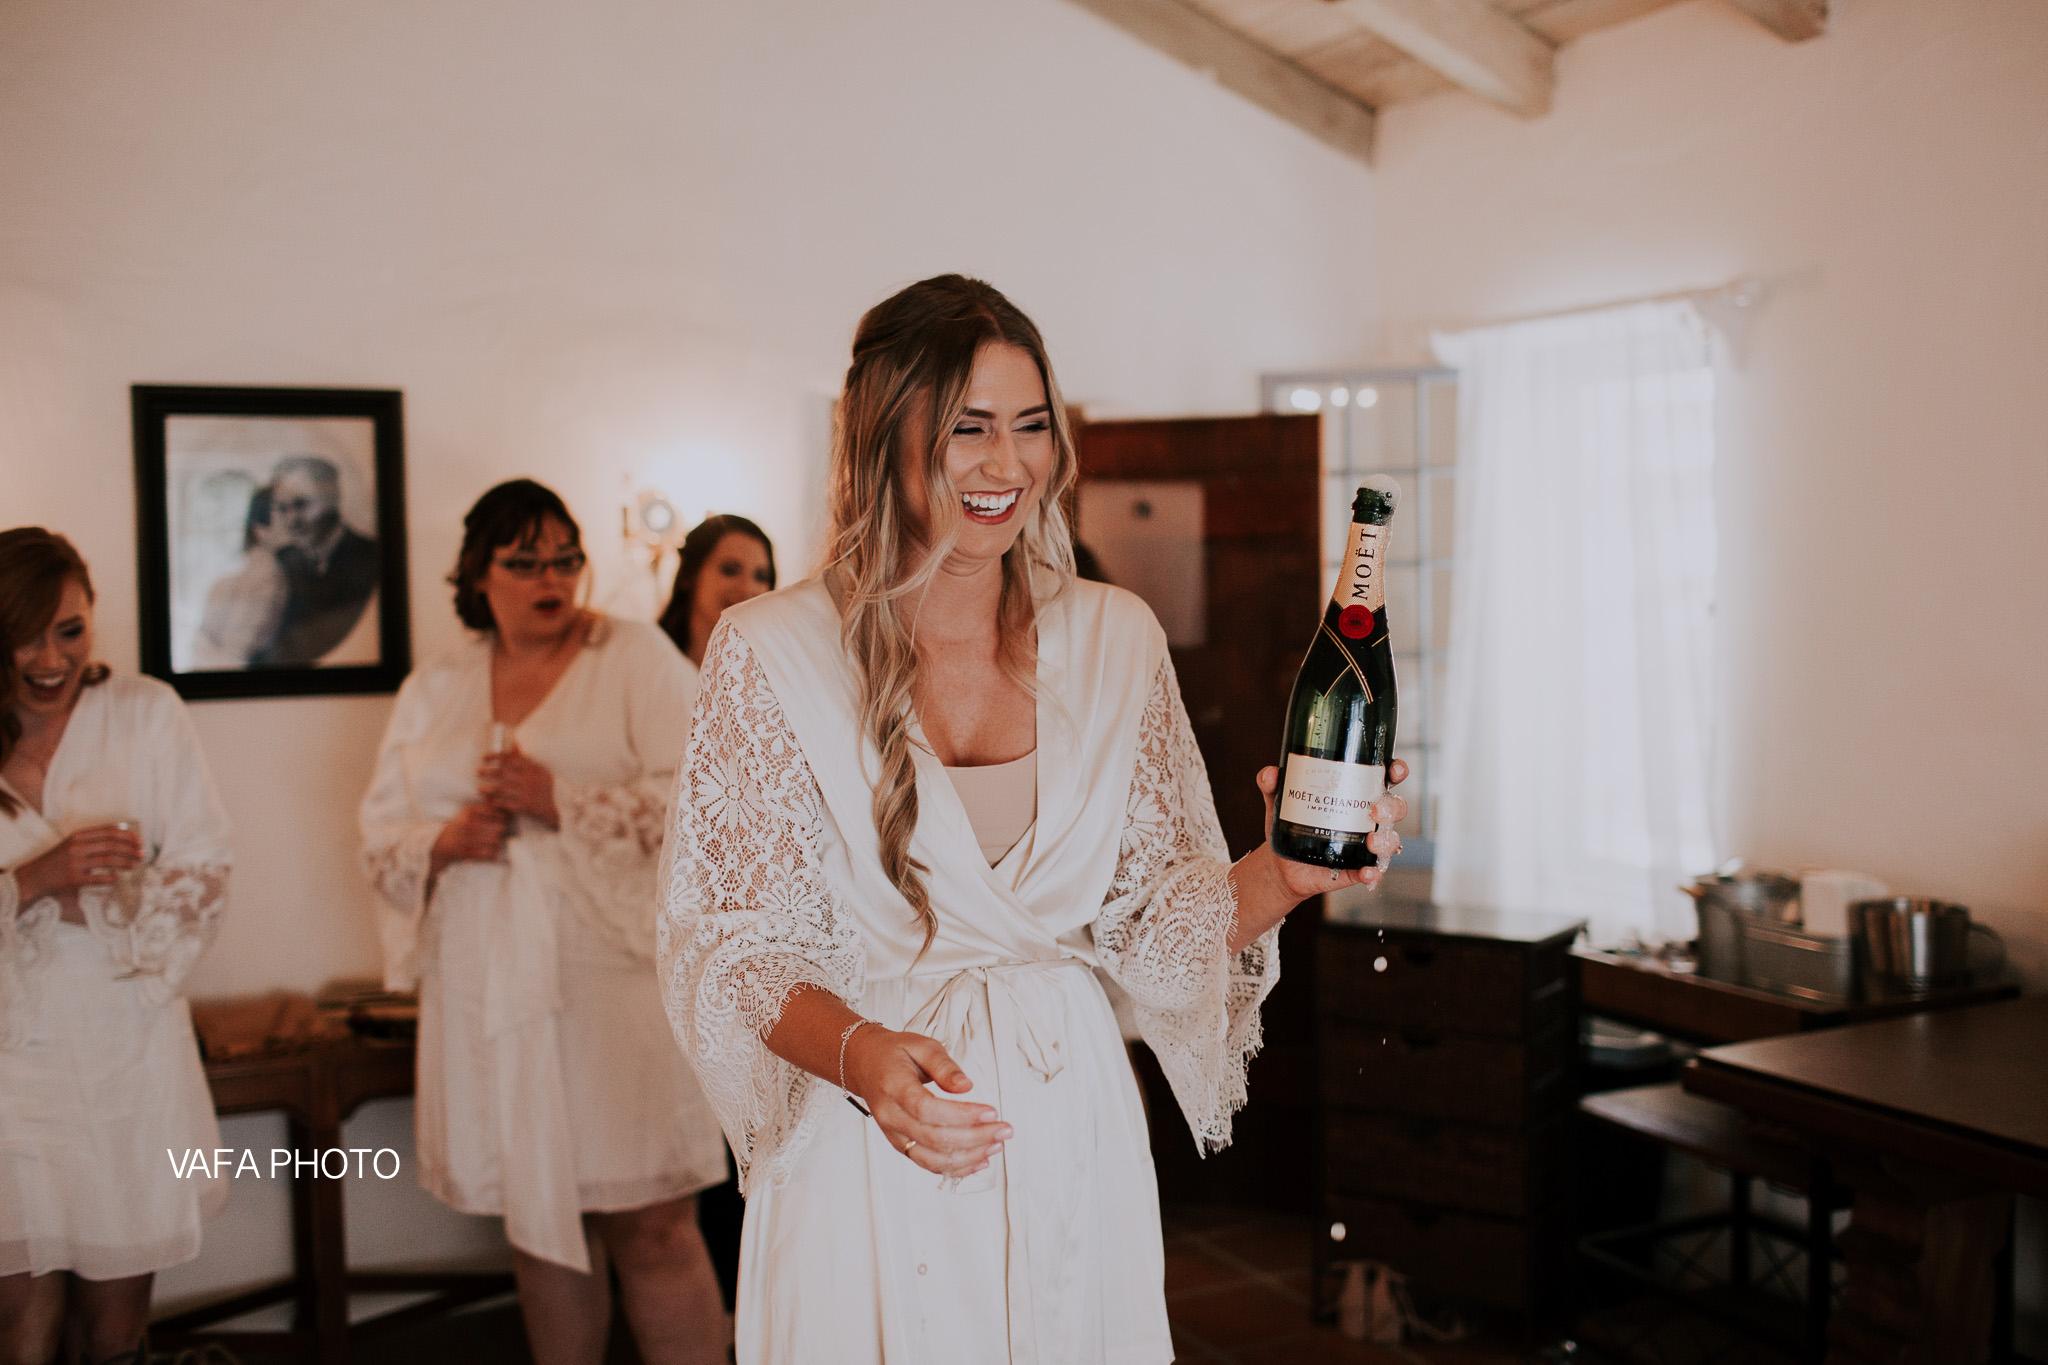 Leo-Carrillo-Ranch-Wedding-Lauren-Mike-Vafa-Photo-92.jpg